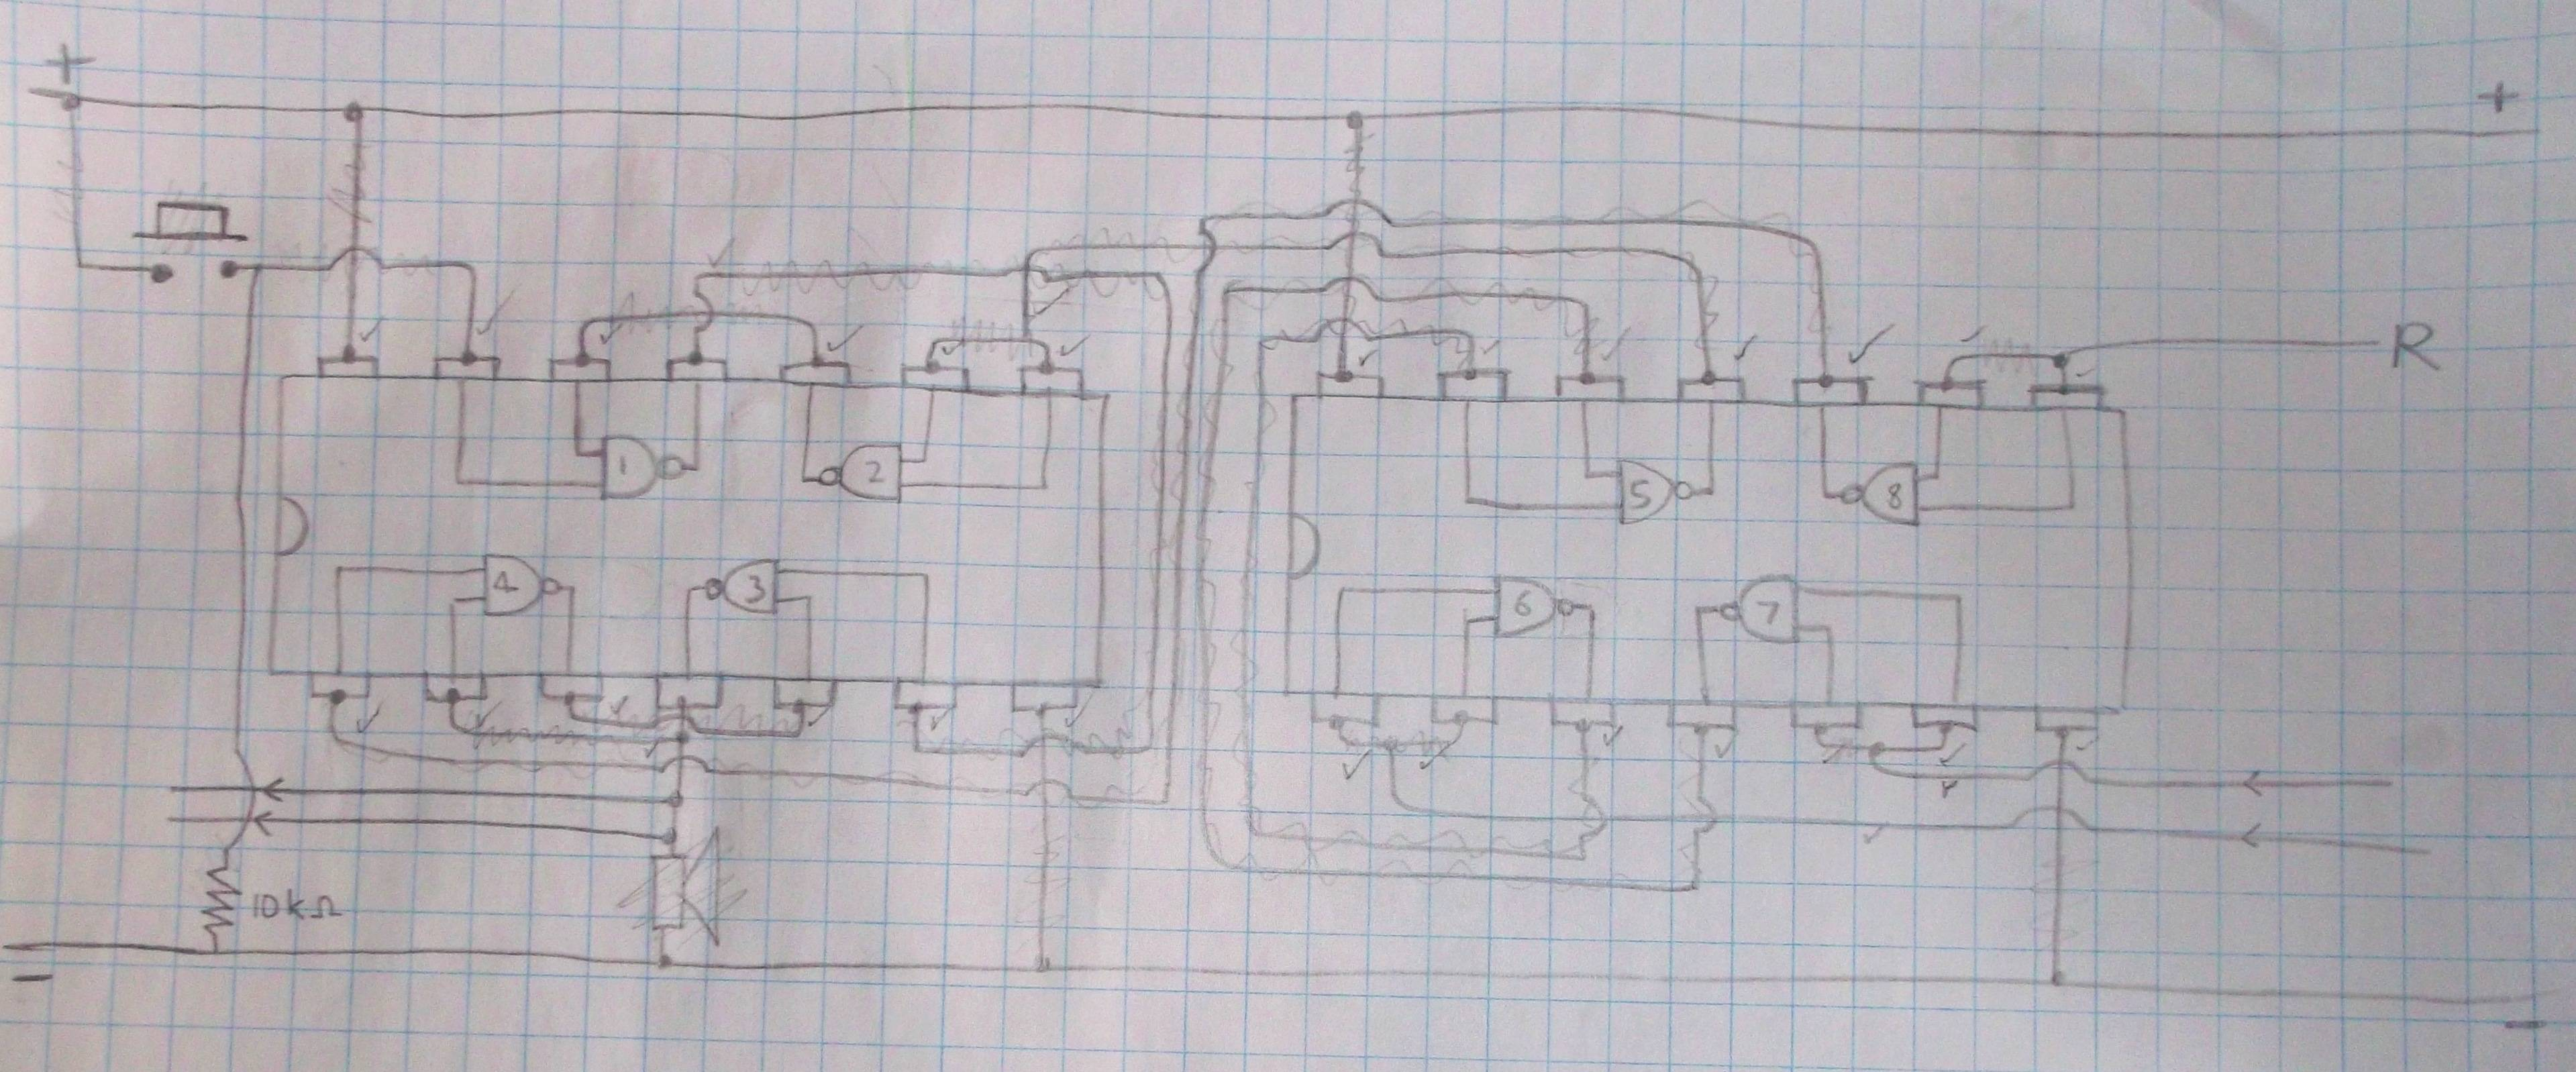 Comfortable Perfect Logic Gates Simulator Online Pattern Electric Circuit Diagram Using Diagrams Studiomotivnet